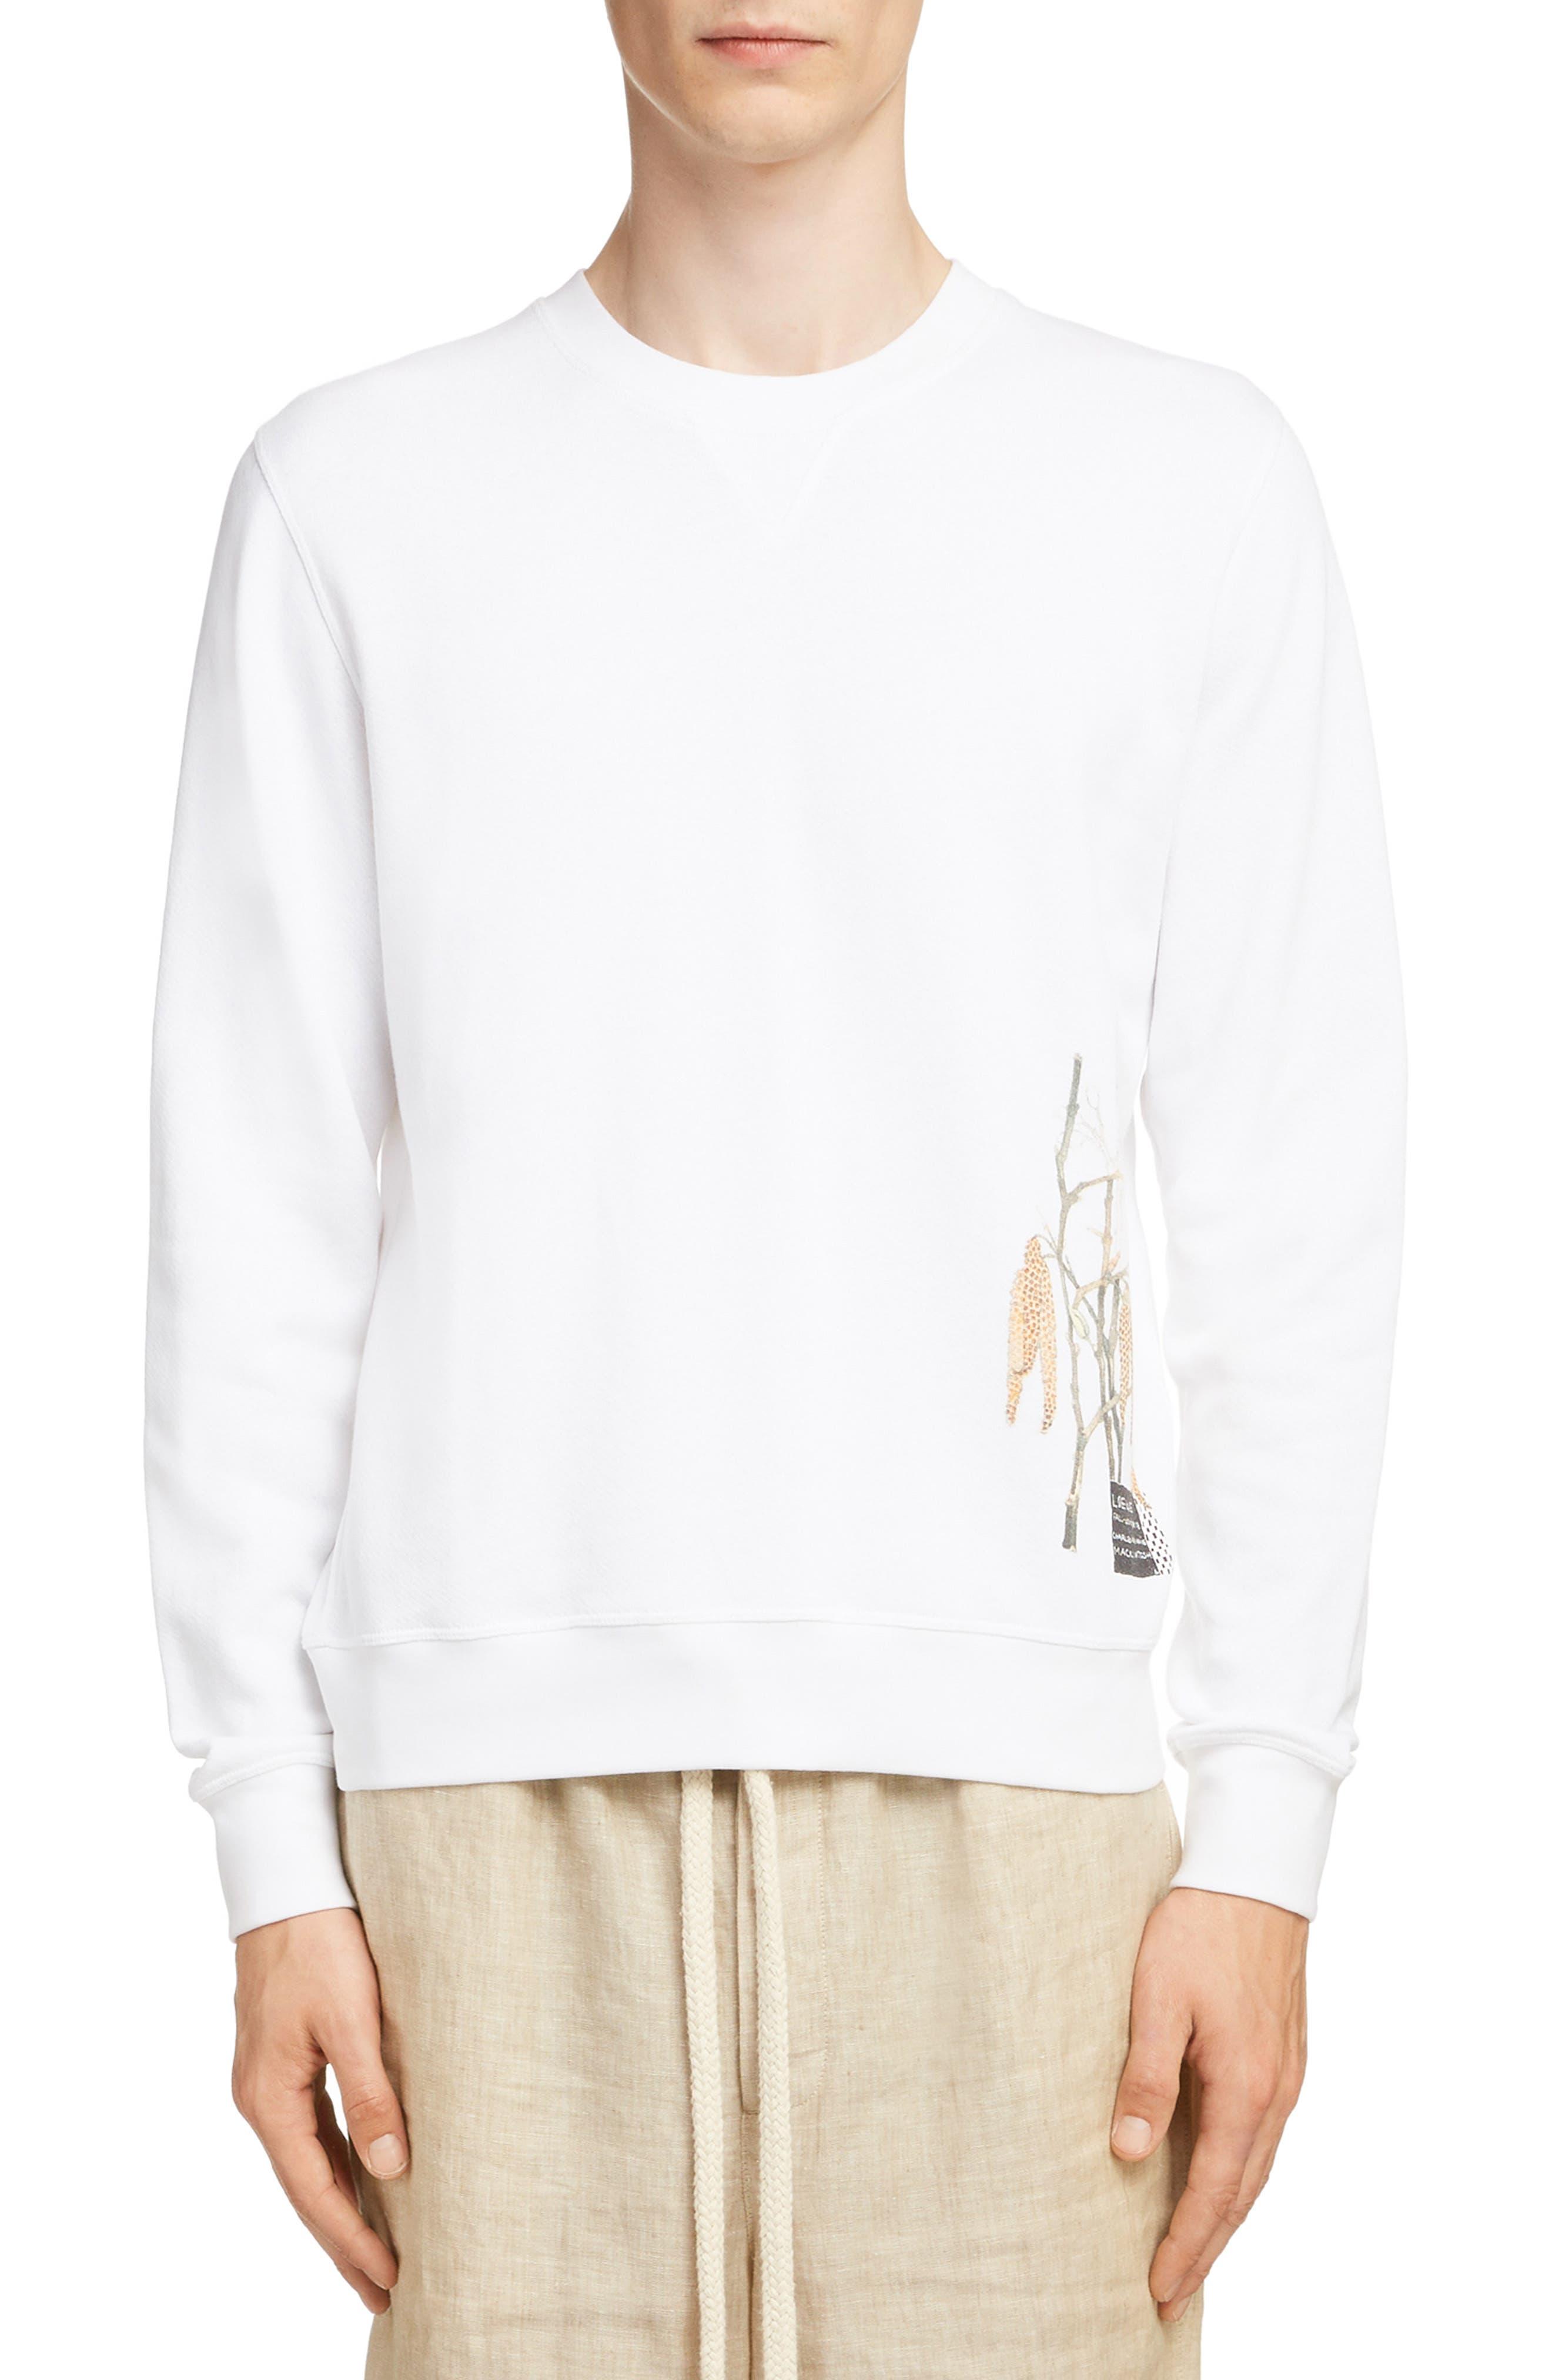 LOEWE Charles Rennie Mackintosh Collection Botanical Print Sweatshirt, Main, color, 2100-WHITE